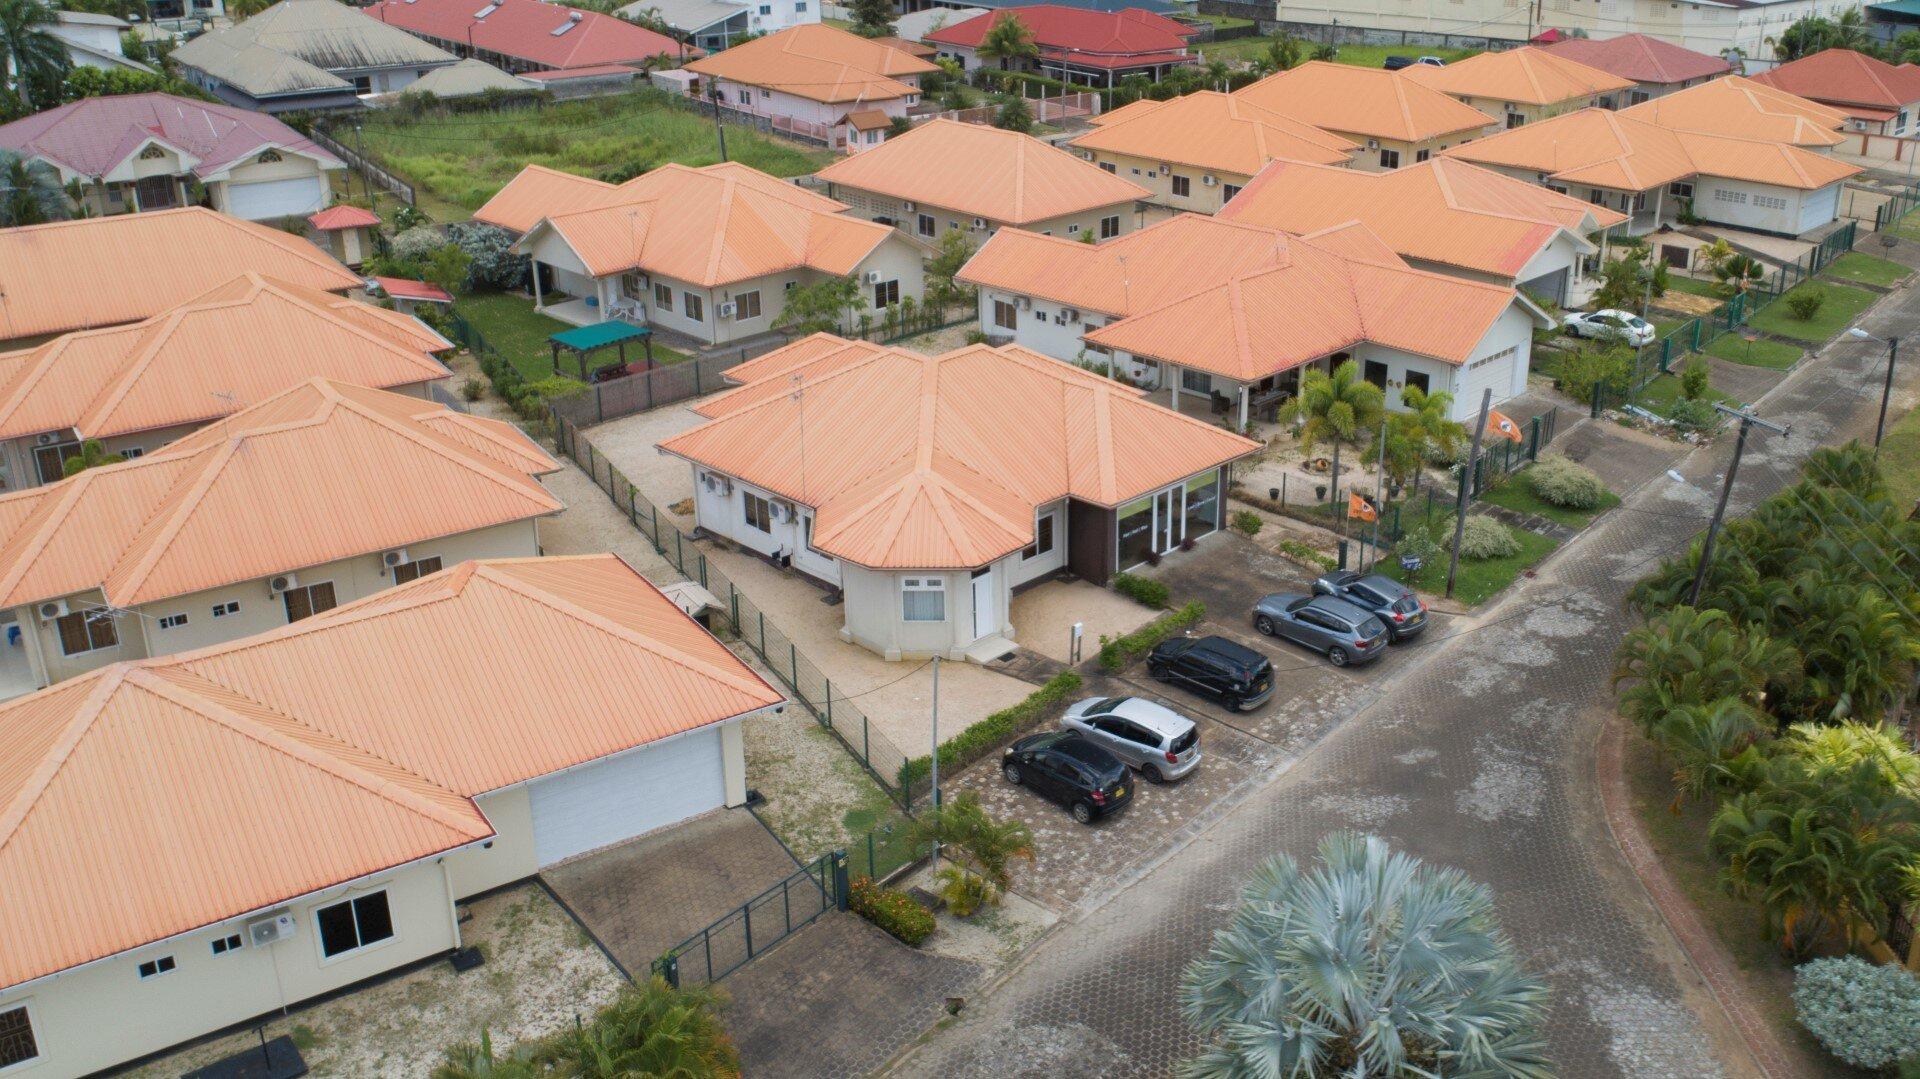 Jainarain Sohansinghlaan 42 - Laagbouw woning met dubbele garage op semi-gated project - Surgoed Makelaardij NV - Paramaribo, Suriname